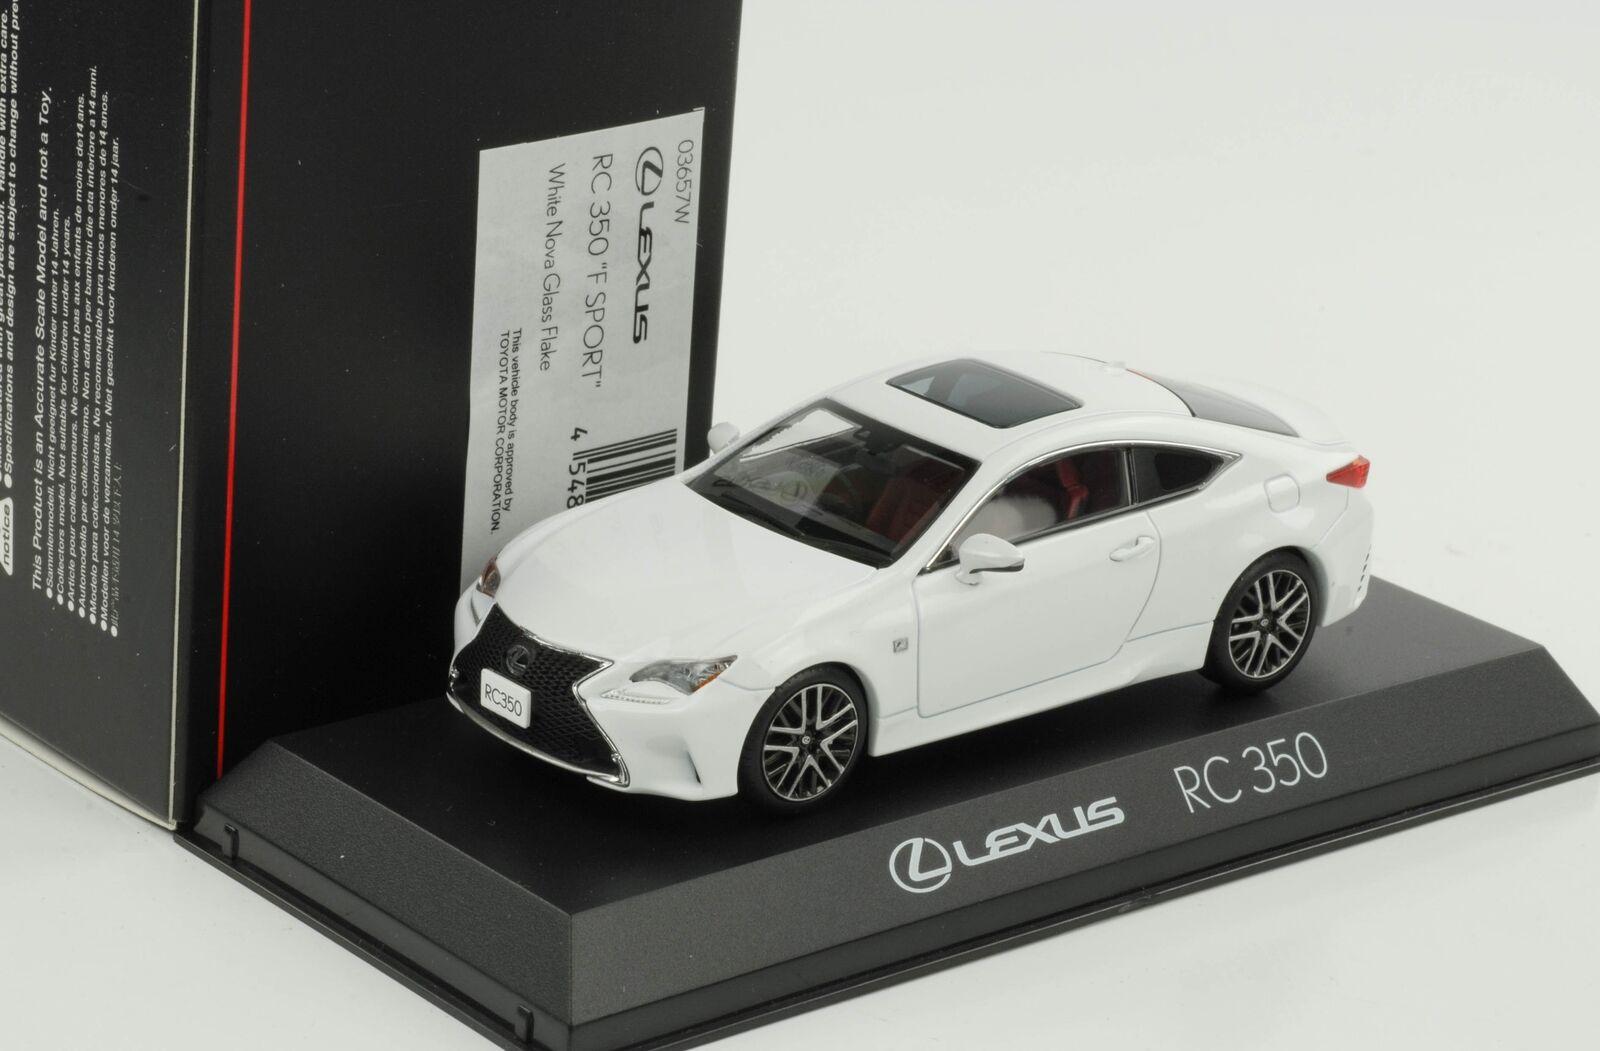 Lexus RC 350 350 350 F Sport White Nova Glass Flake 1 43 Kyosho diecast aaab64